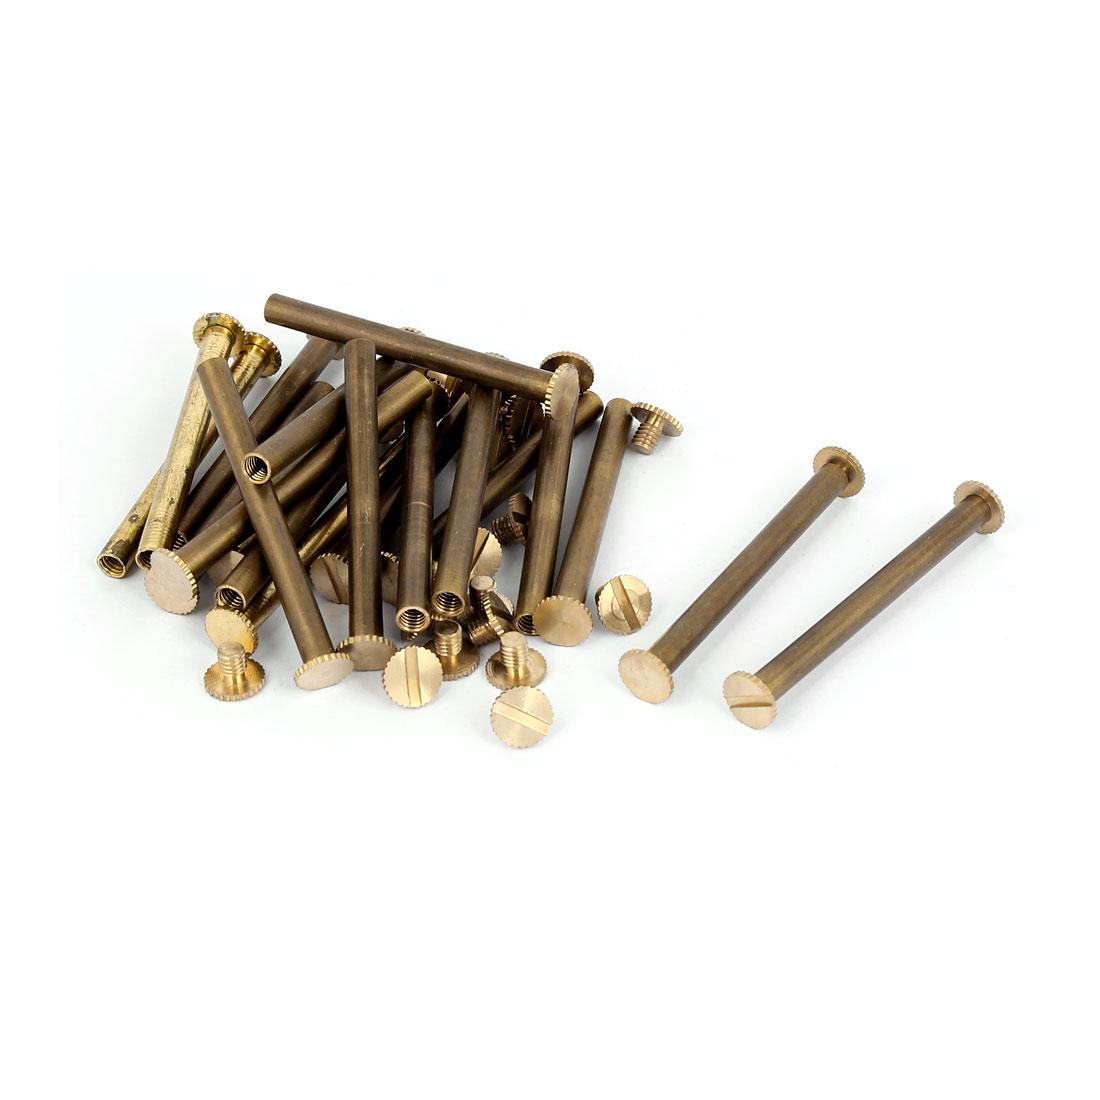 Purse Belts Scrapbooks Knurled Binding Chicago Screws Posts M5 x 50mm 20 Pcs